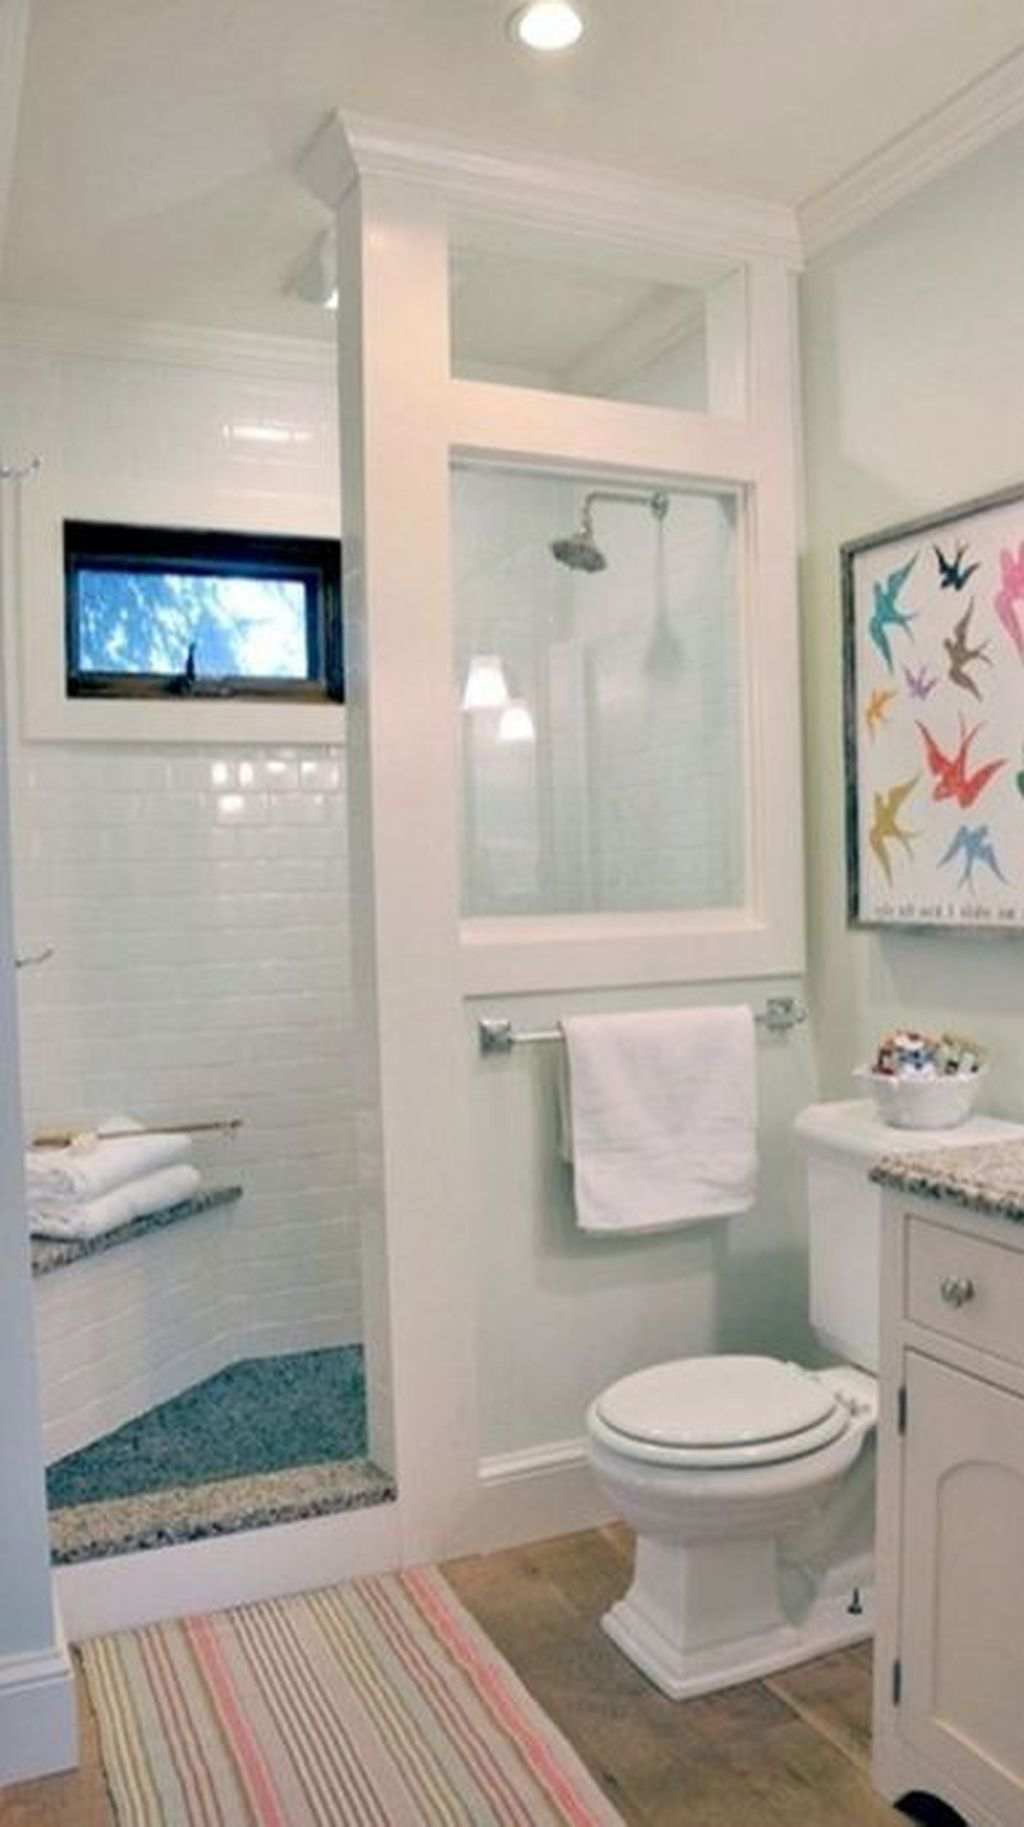 42 Cool Small Bathroom Remodel Ideas Bathroom Shower Design Small Bathroom Small Bathroom Remodel